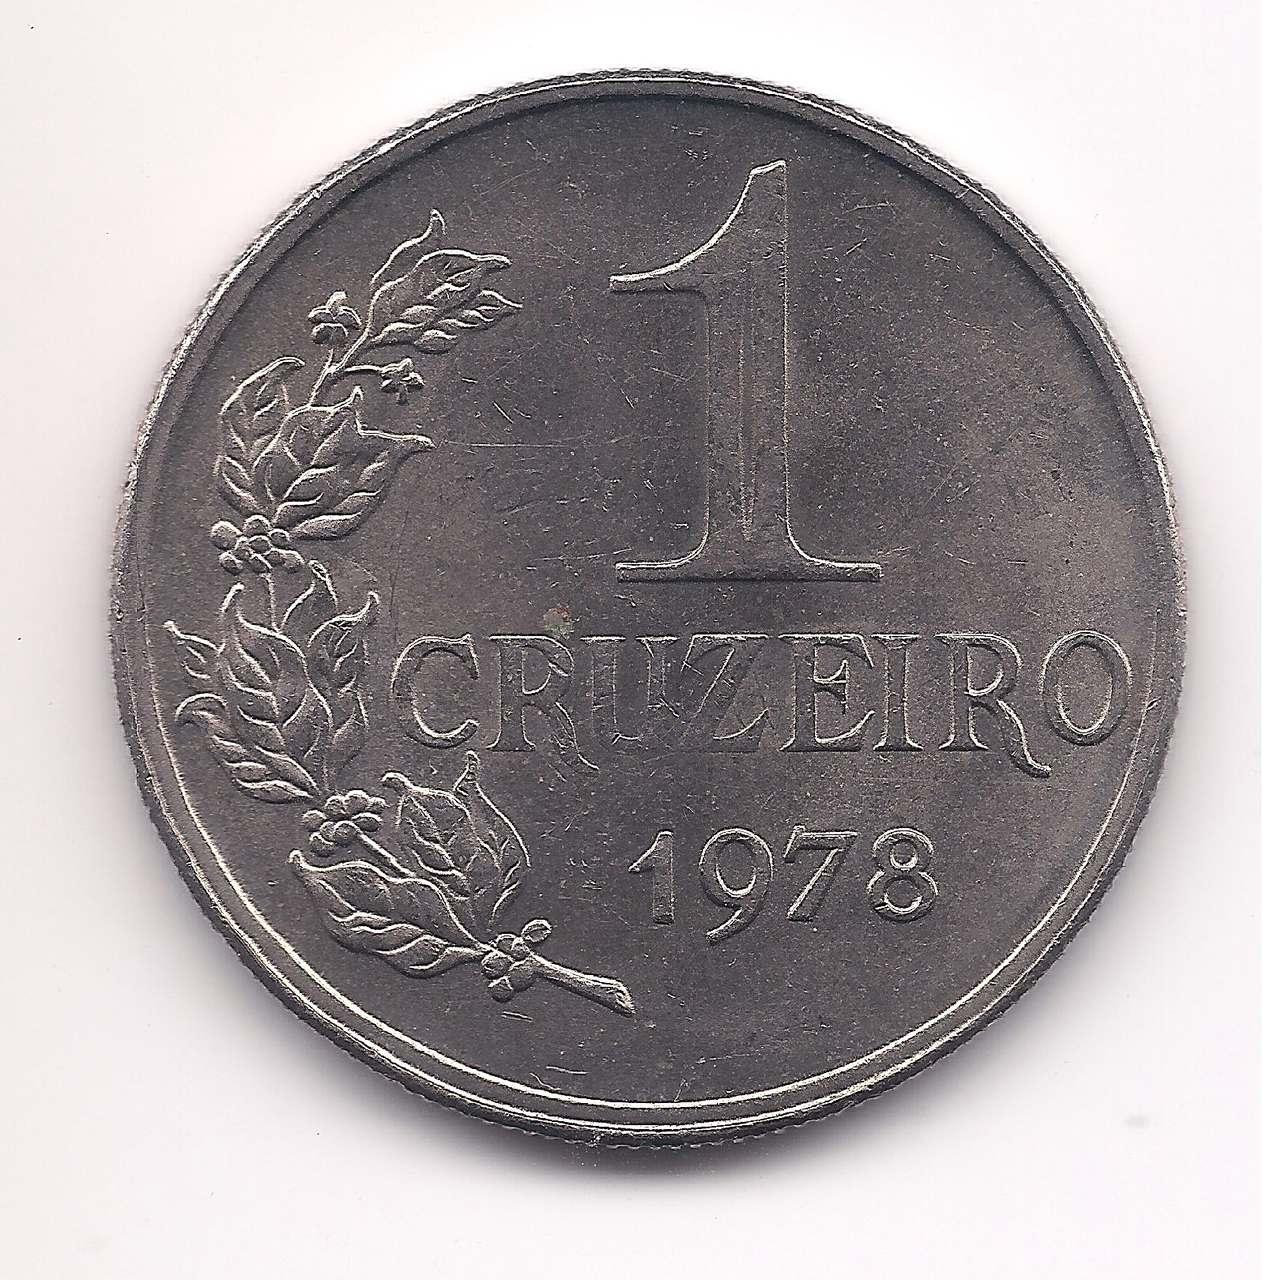 1 Cruzeiro 1978 - Escassa